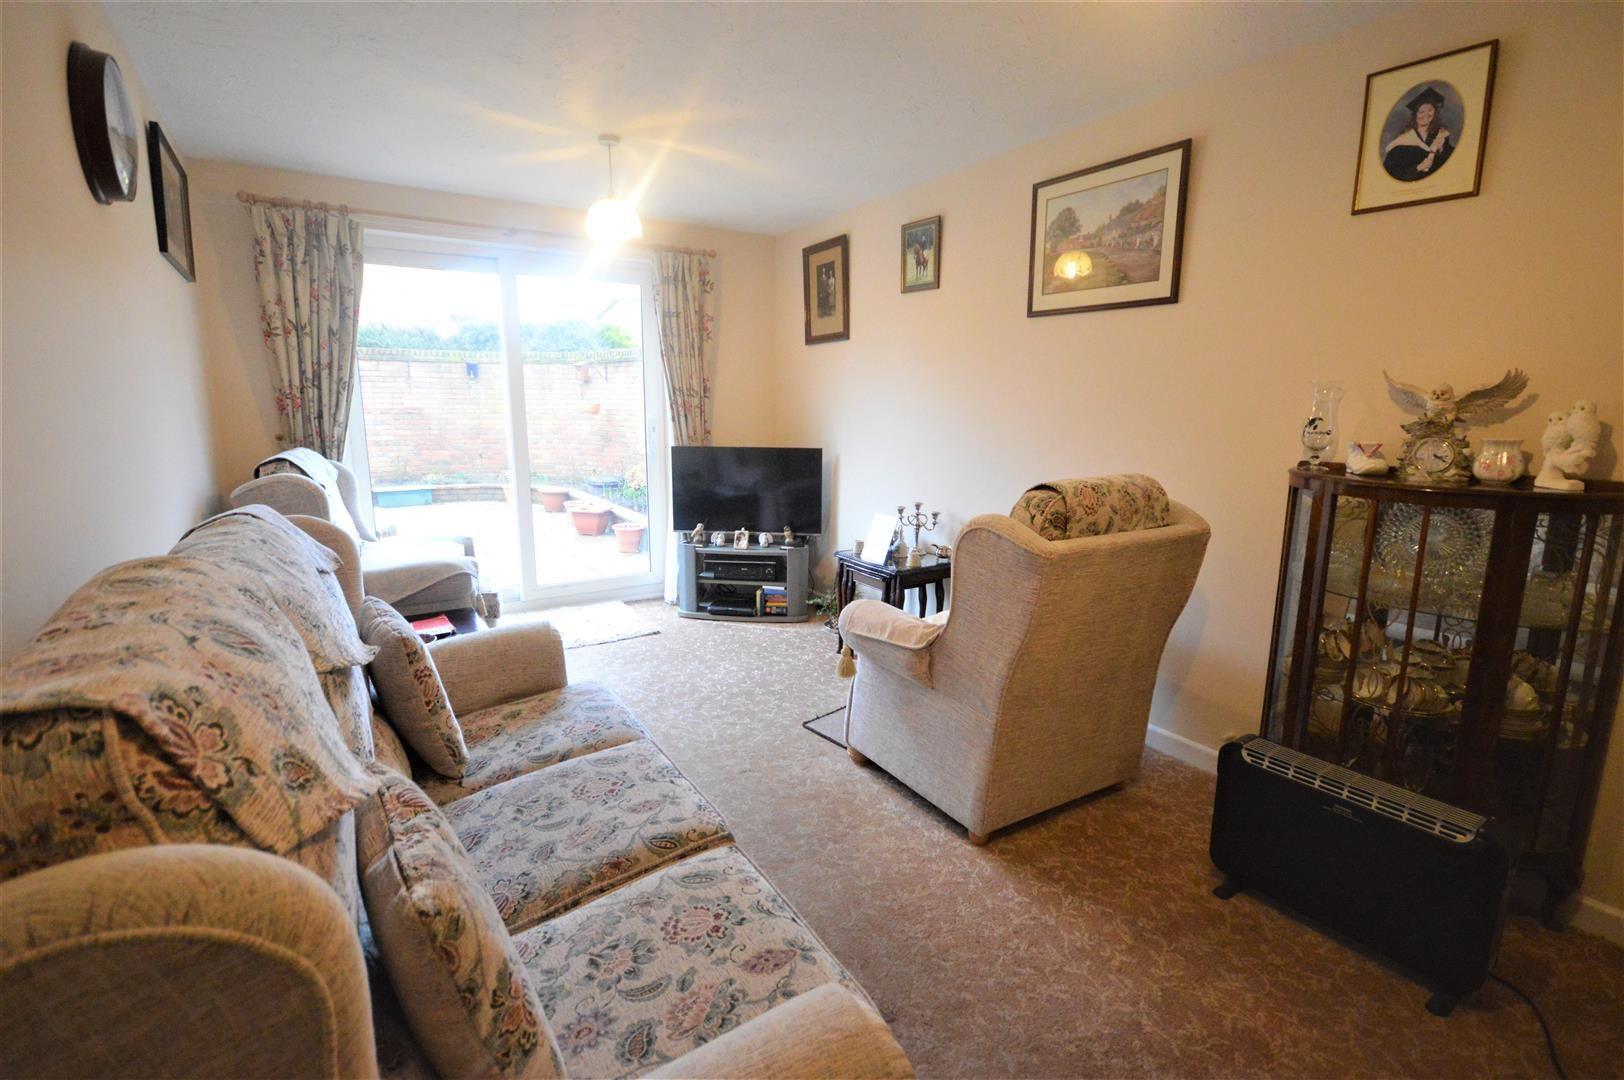 3 bed detached for sale in Leominster  - Property Image 2